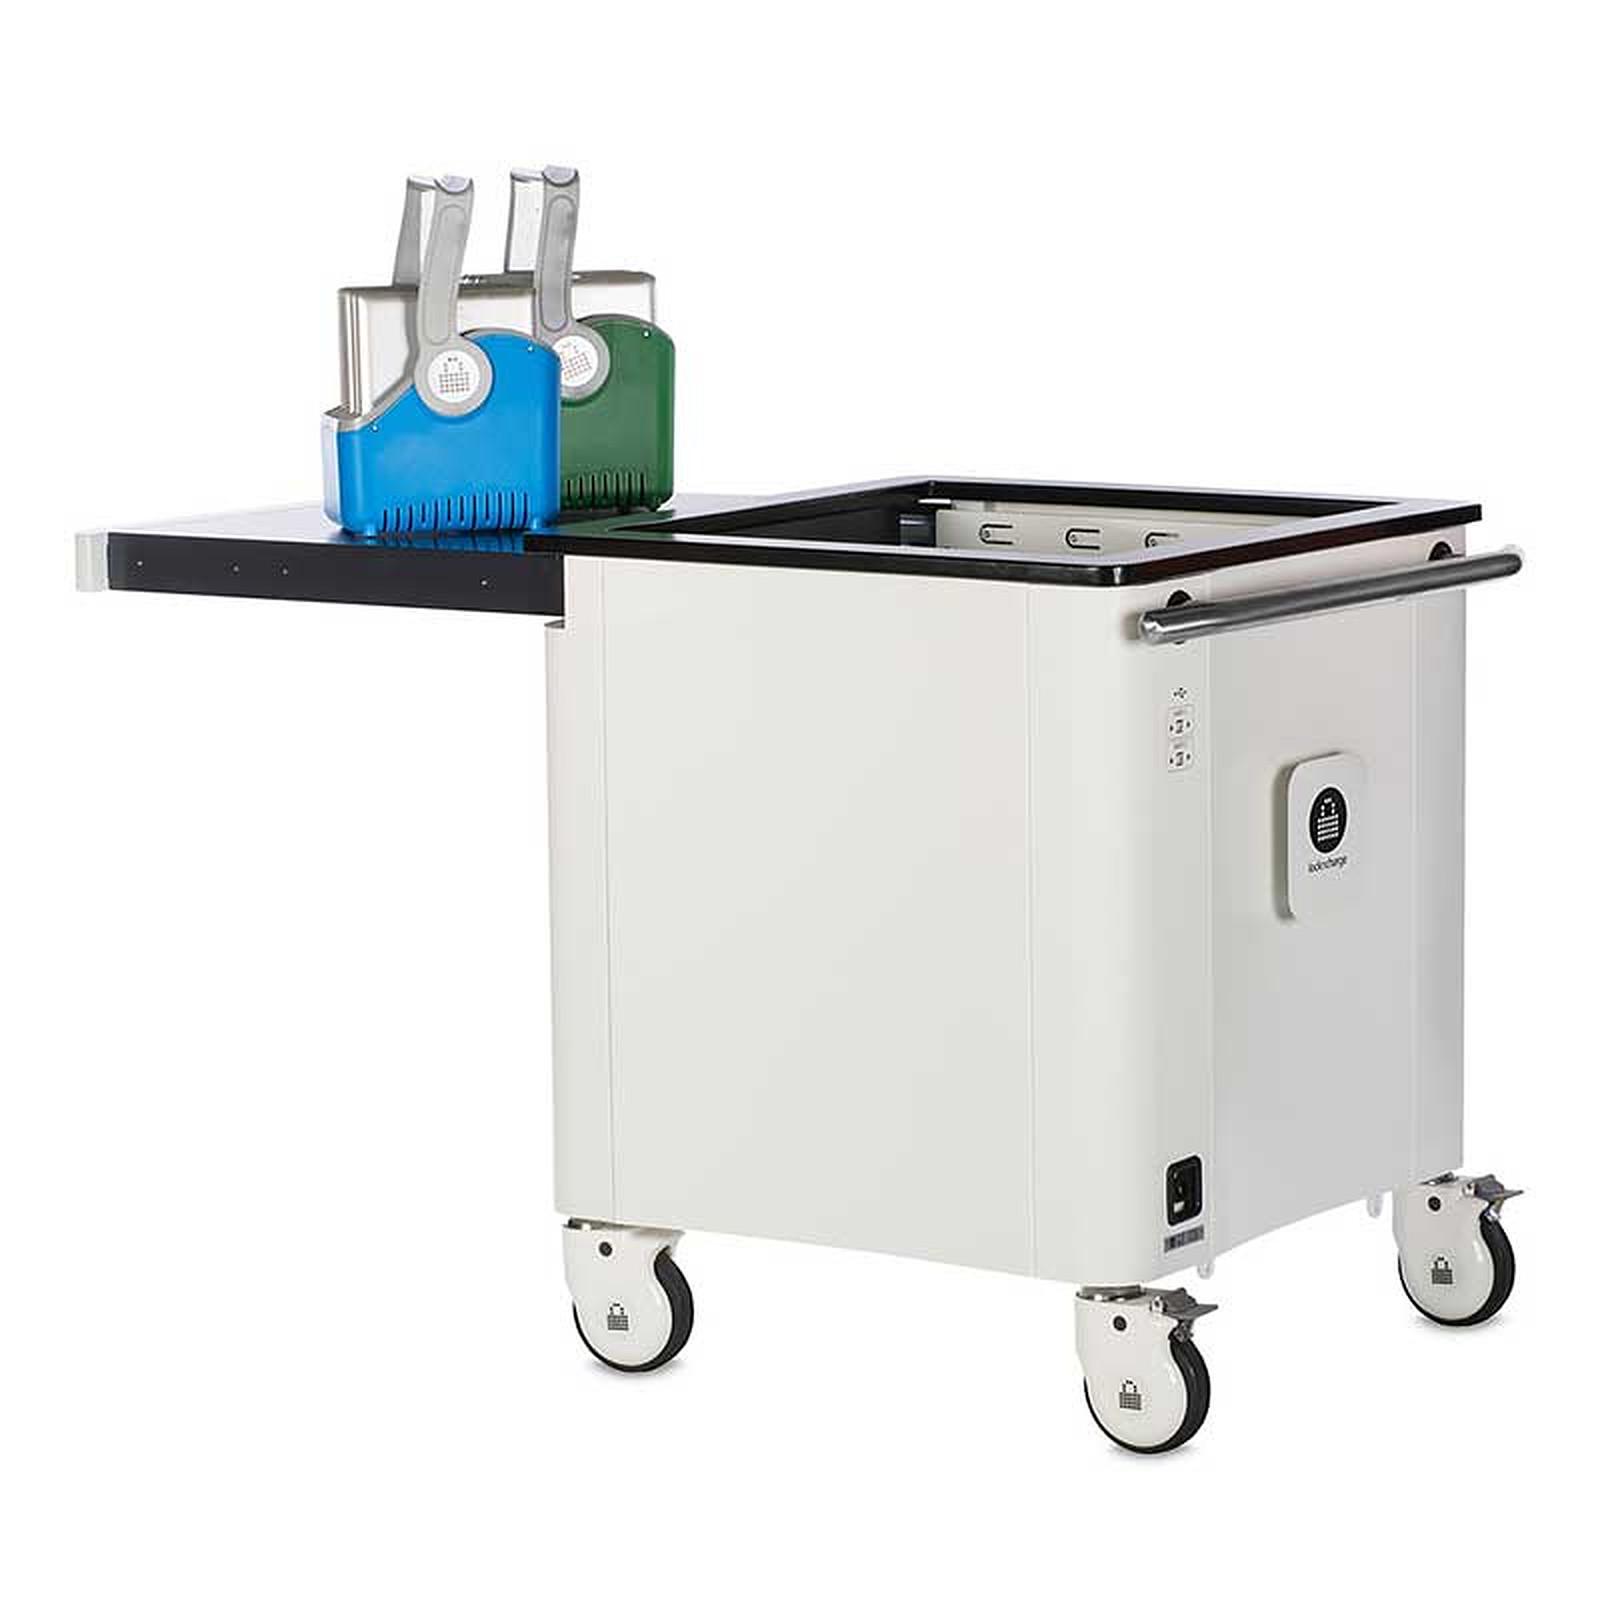 LocknCharge iQ 30 Cart